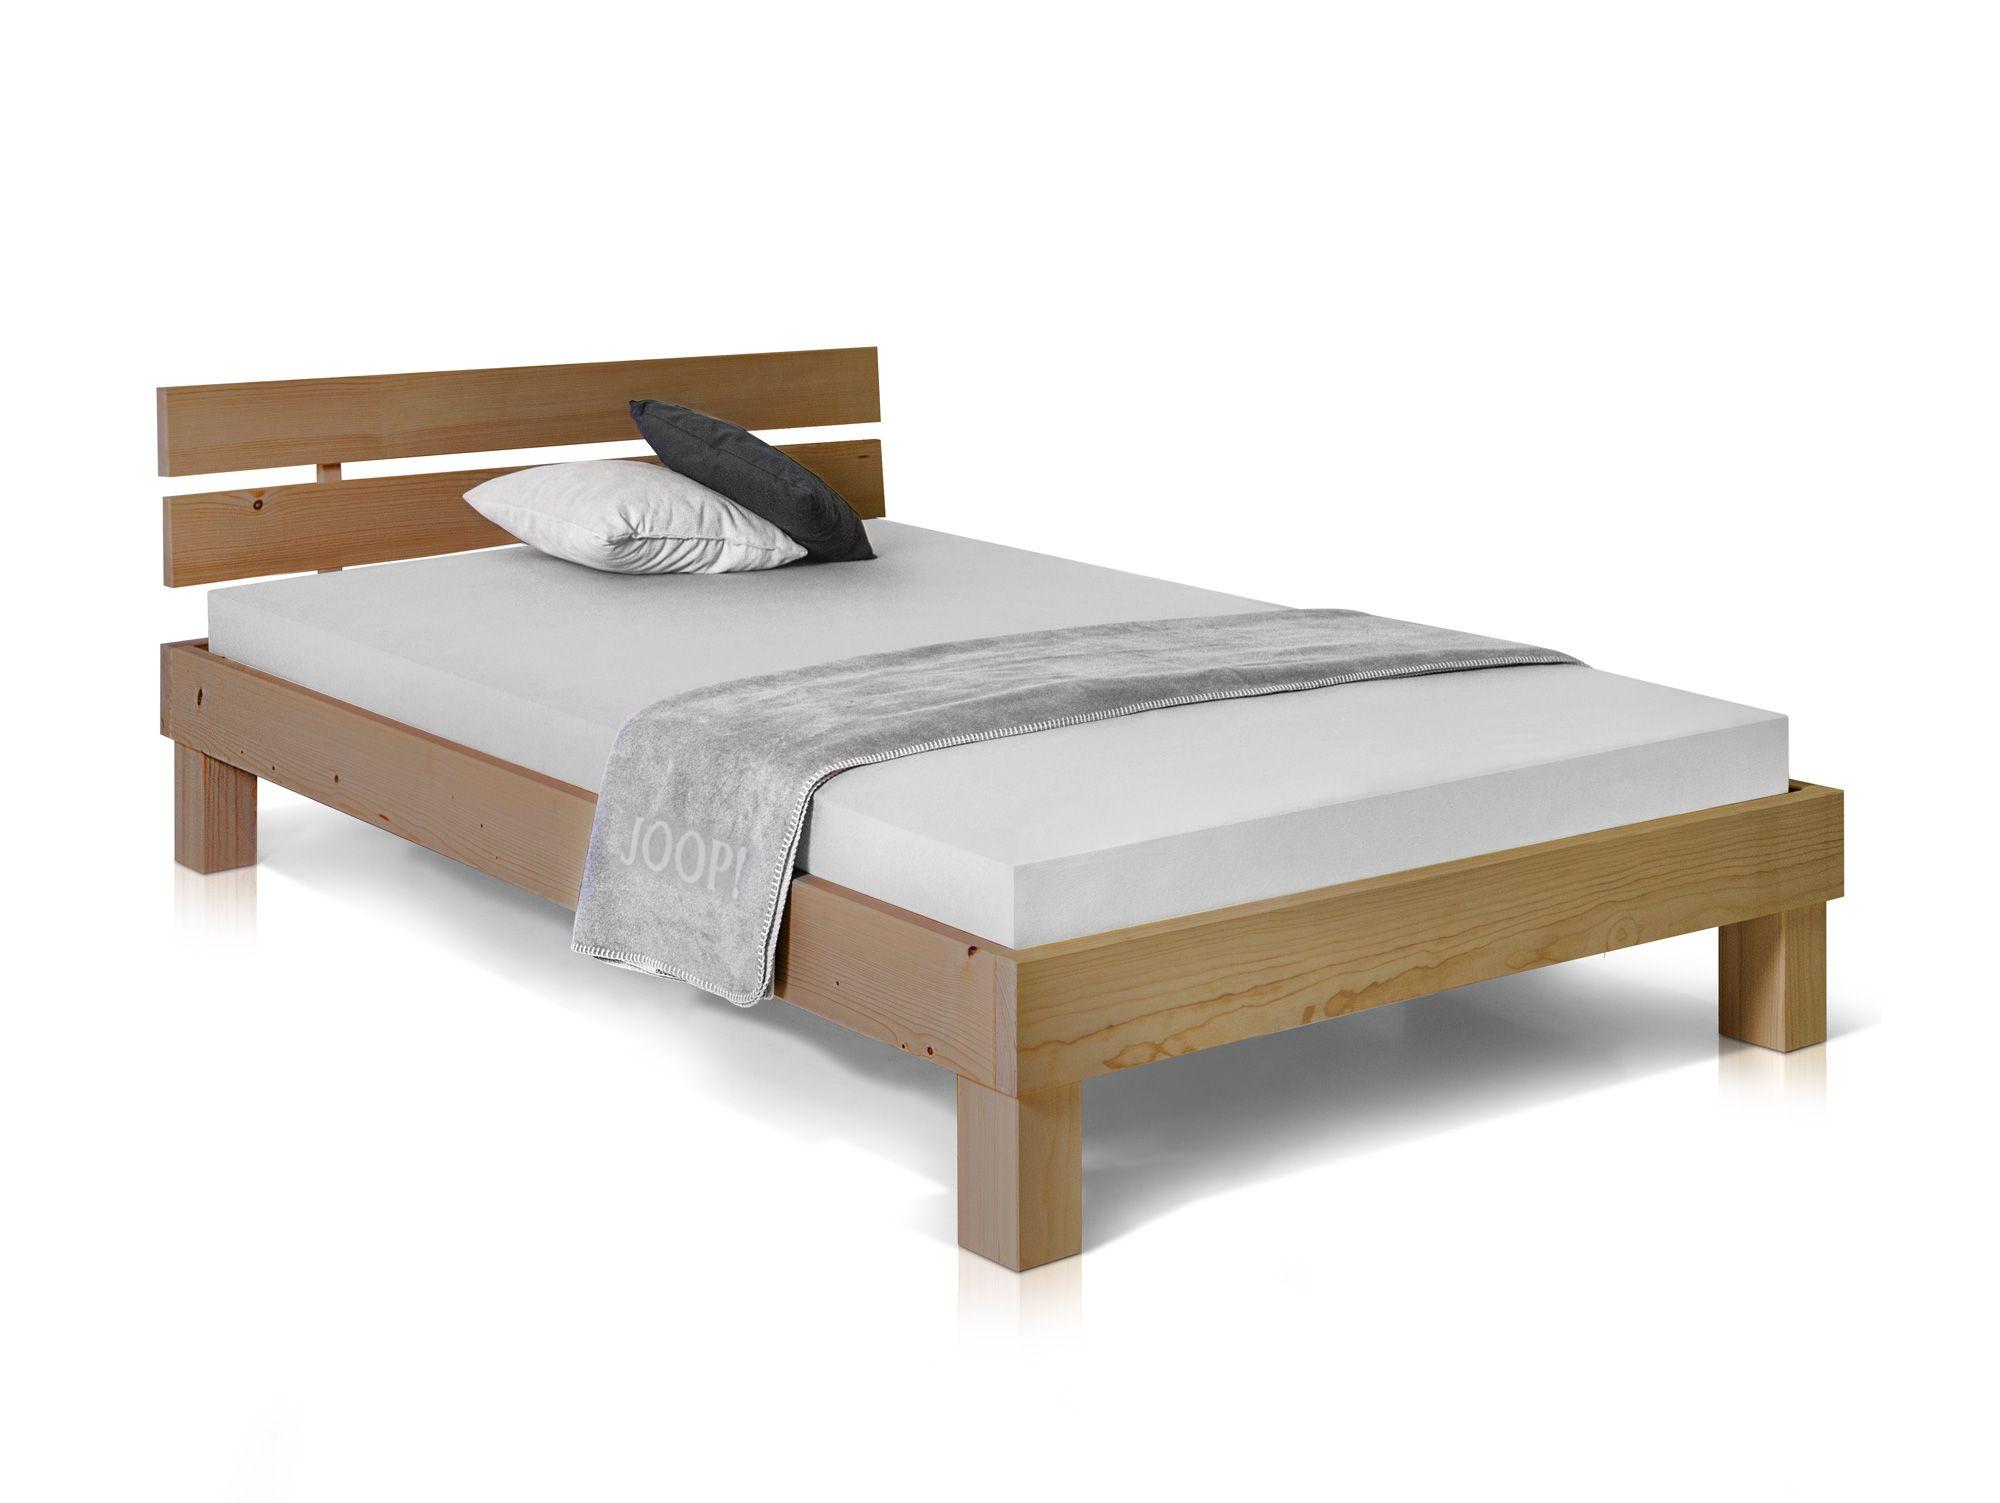 Pumba Massivholzbett Fichte 120x200 Cm Eichefarbig Massivholzbett Bett Massivholz Bett